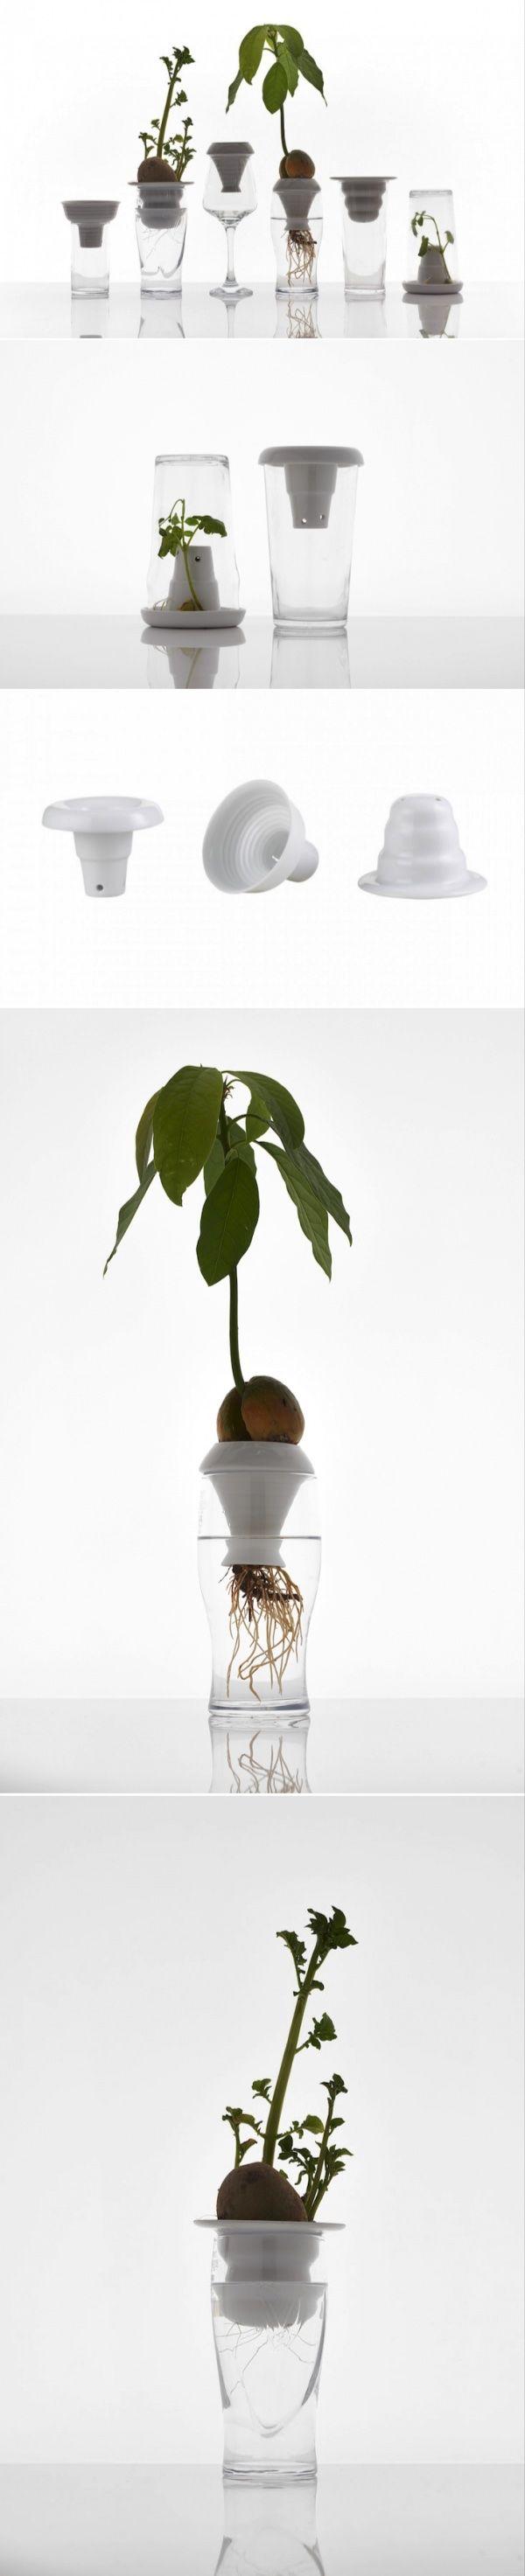 Root System: Ceramic Plant Funnels from Alicja Patanowska